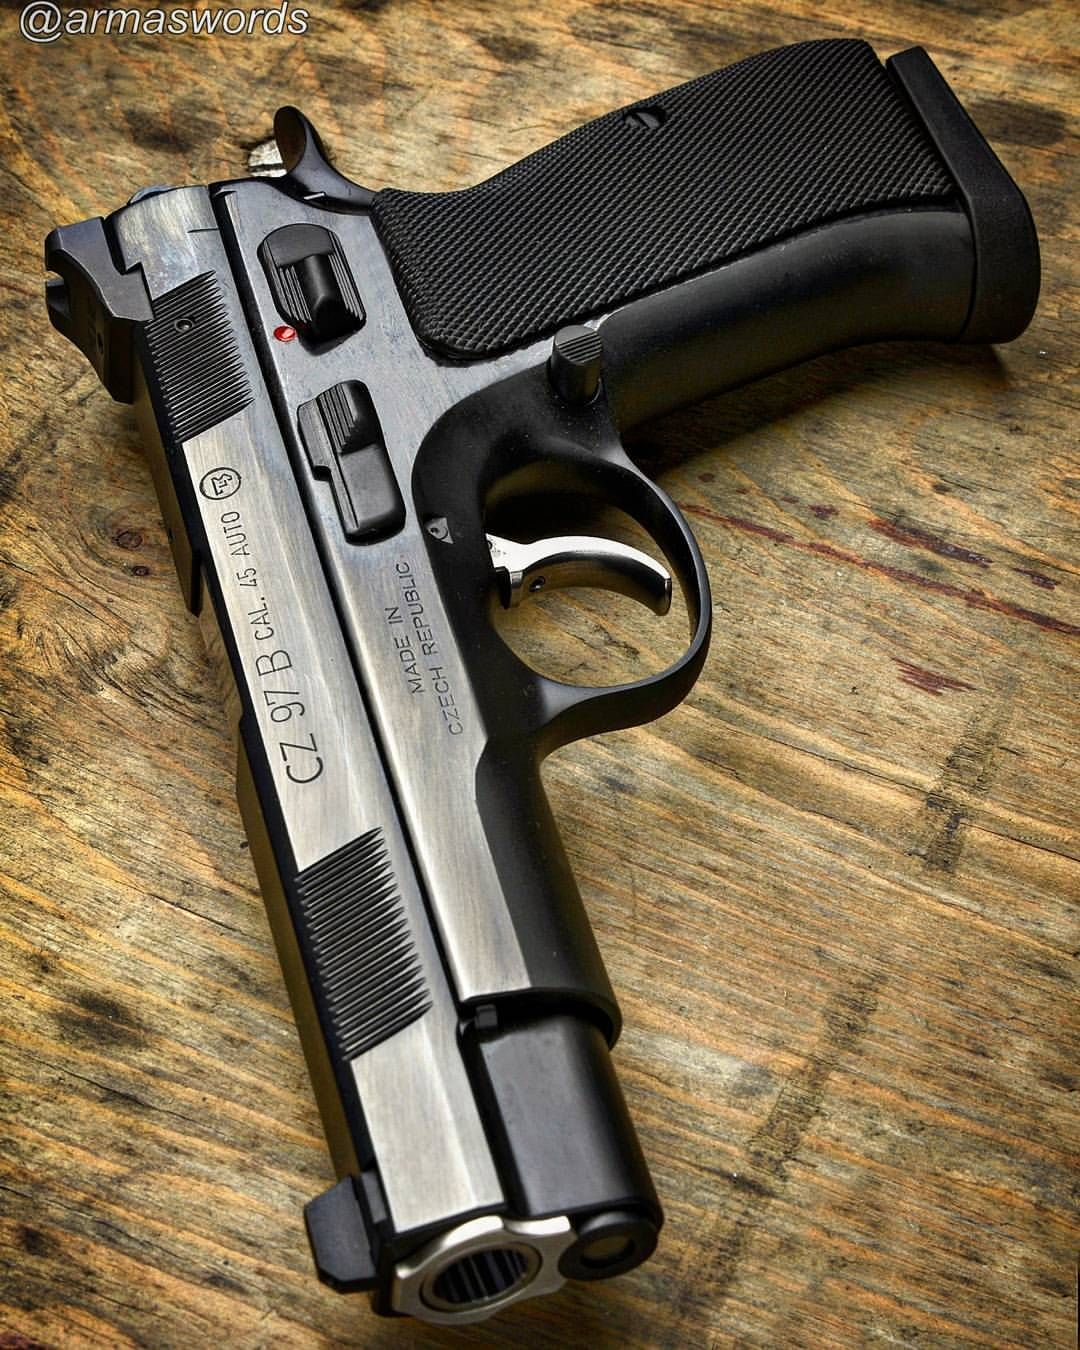 Manufacturer: CZ Mod. CZ97B Type - Tipo: Pistol Caliber - Calibre: 45 ACP Capacity - Capacidade: 10 Rounds Barrel length - Comp.Cano: 4.8 Weight - Peso: 1088...